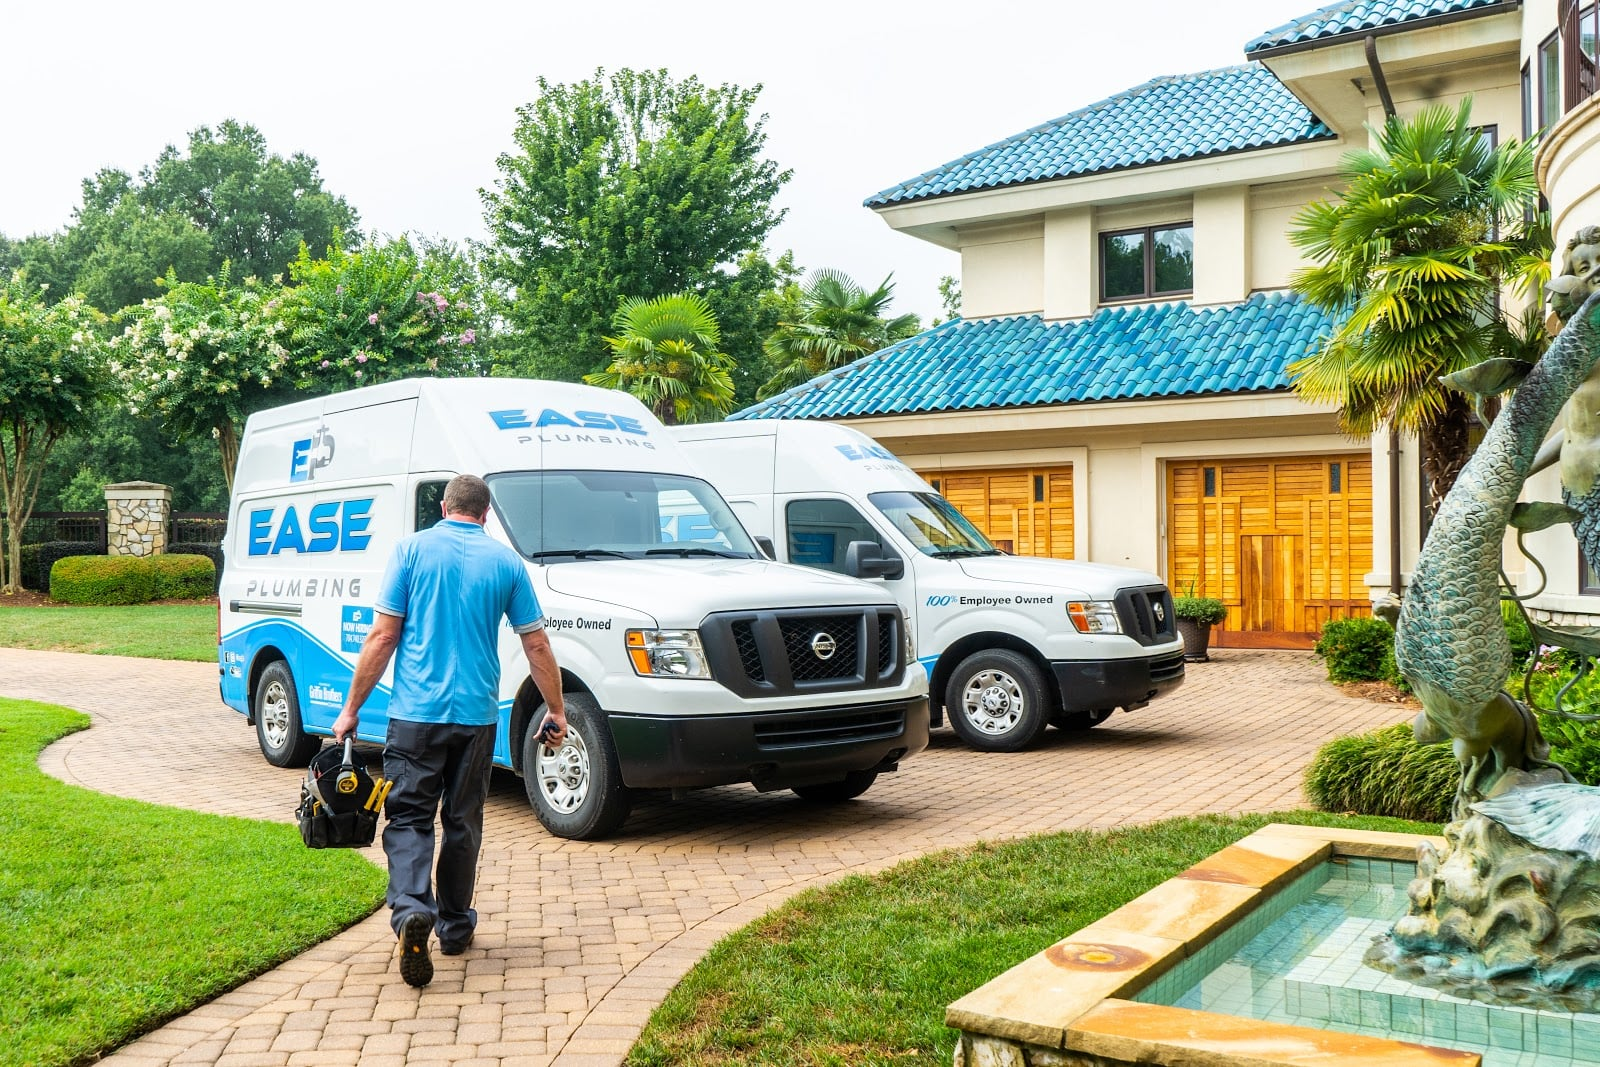 Ease Plumbing, Charlotte, North Carolina